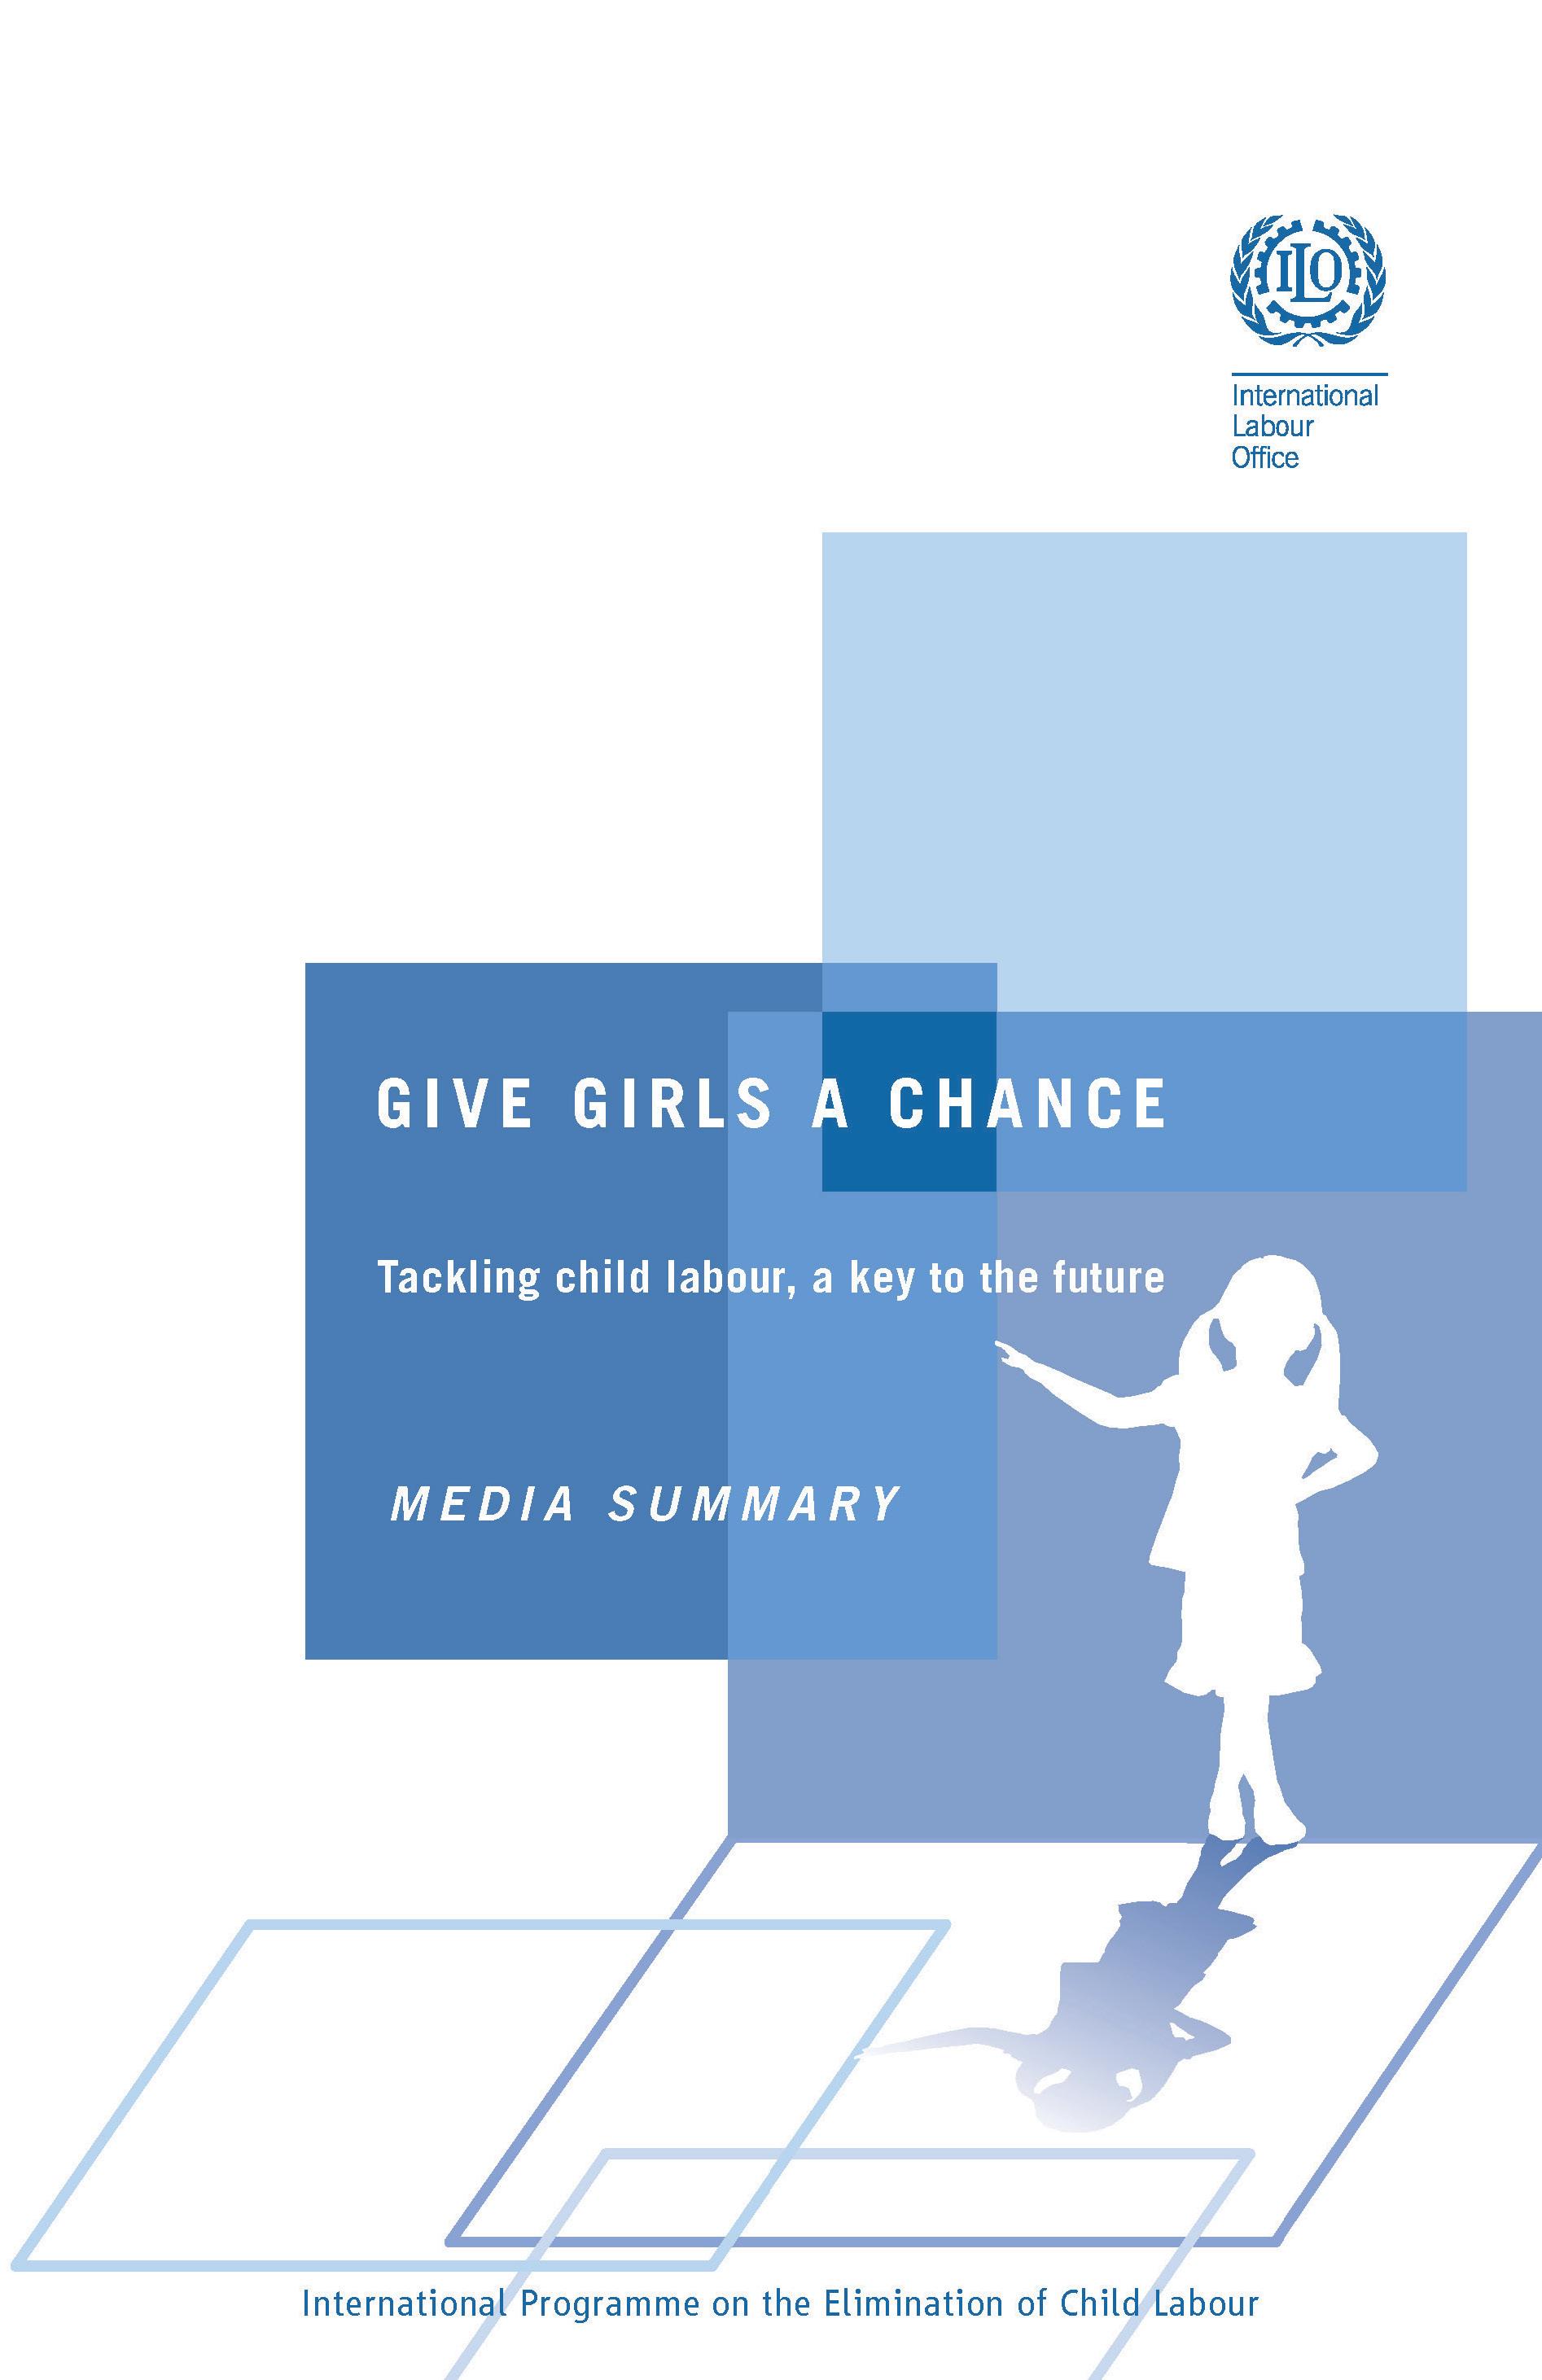 Girls & CL Report_Media Summary_En_WCMS